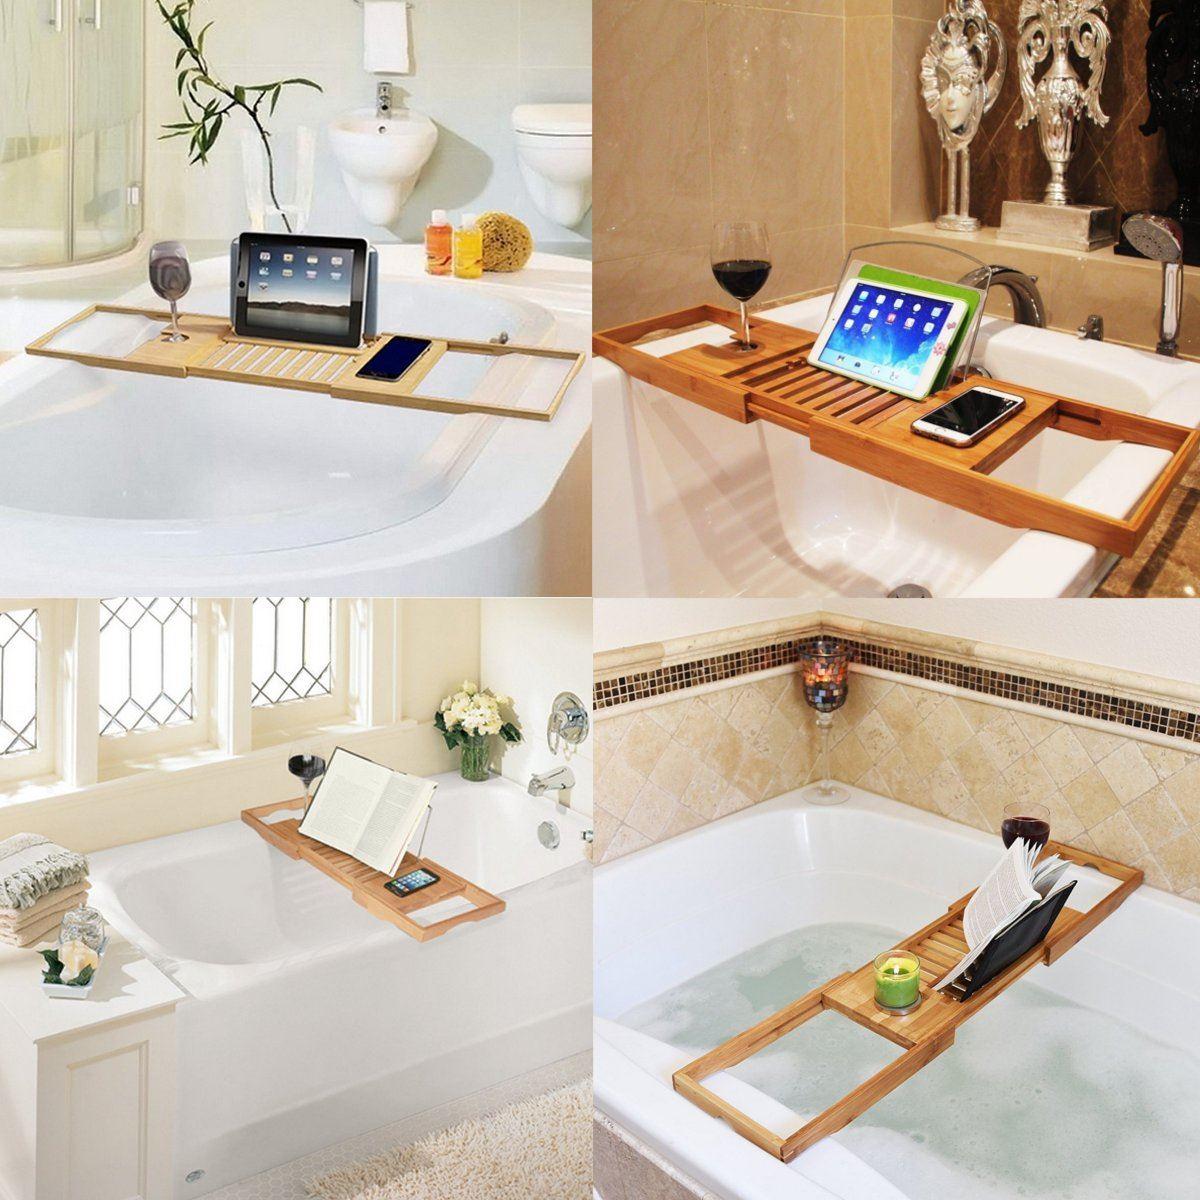 Bathroom Bath Tub Books phone Wine Cup Rack Shower Tray Holder Home ...